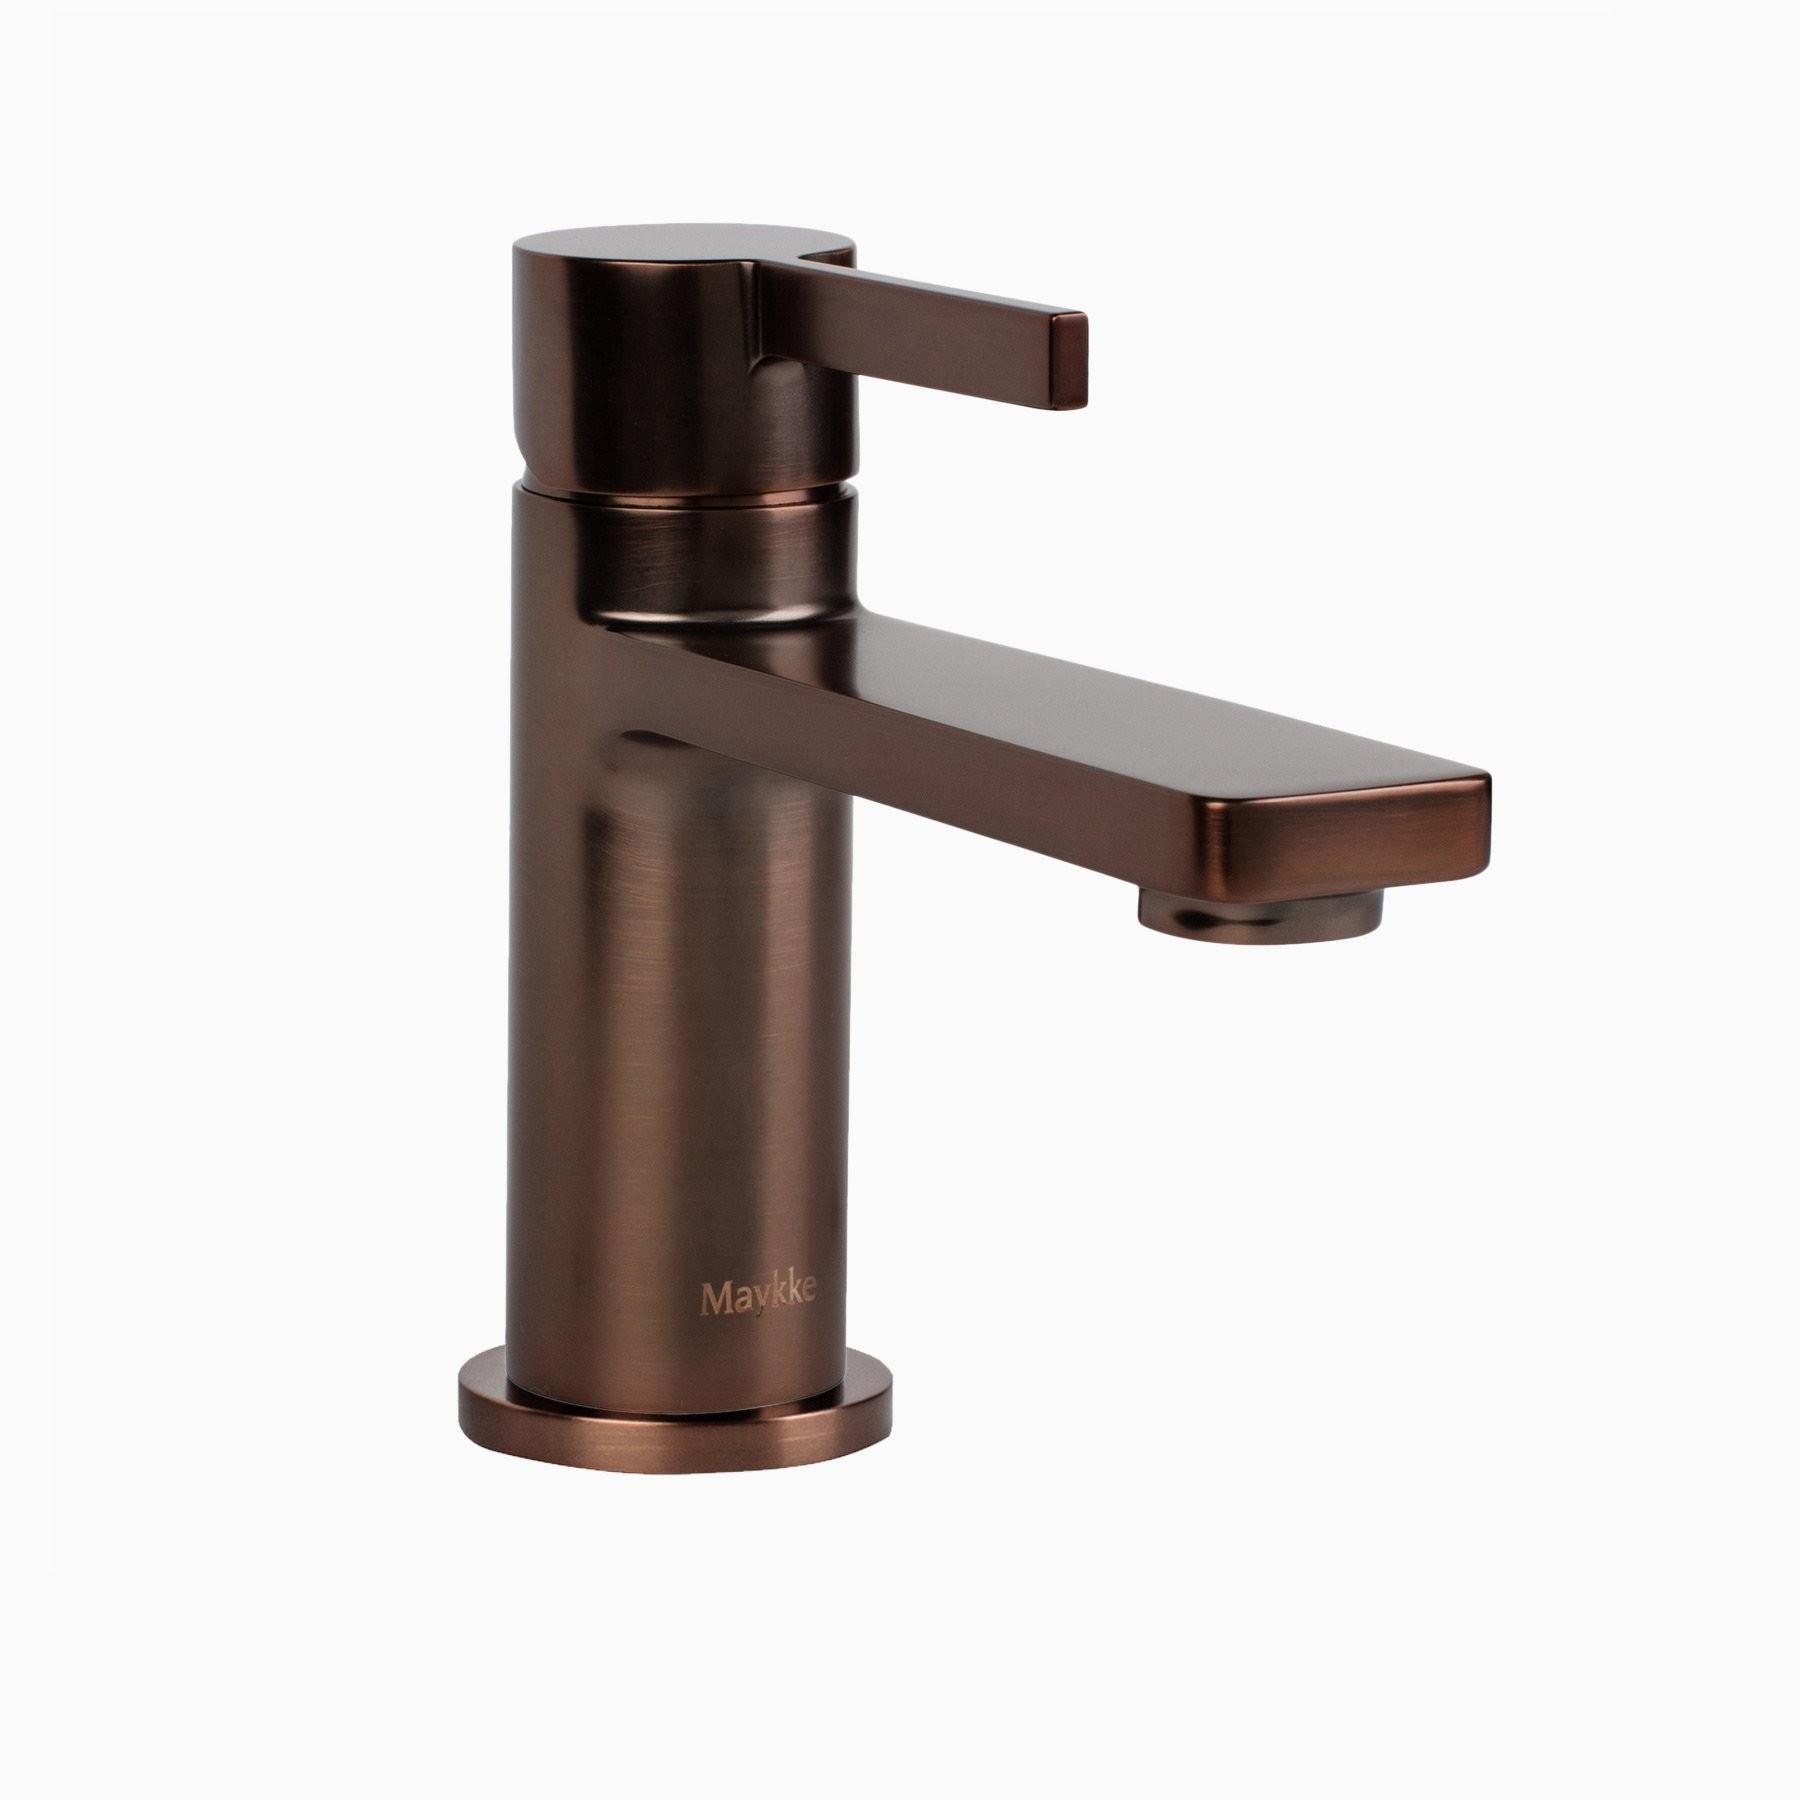 Friedrich Br Bathroom Sink Faucet